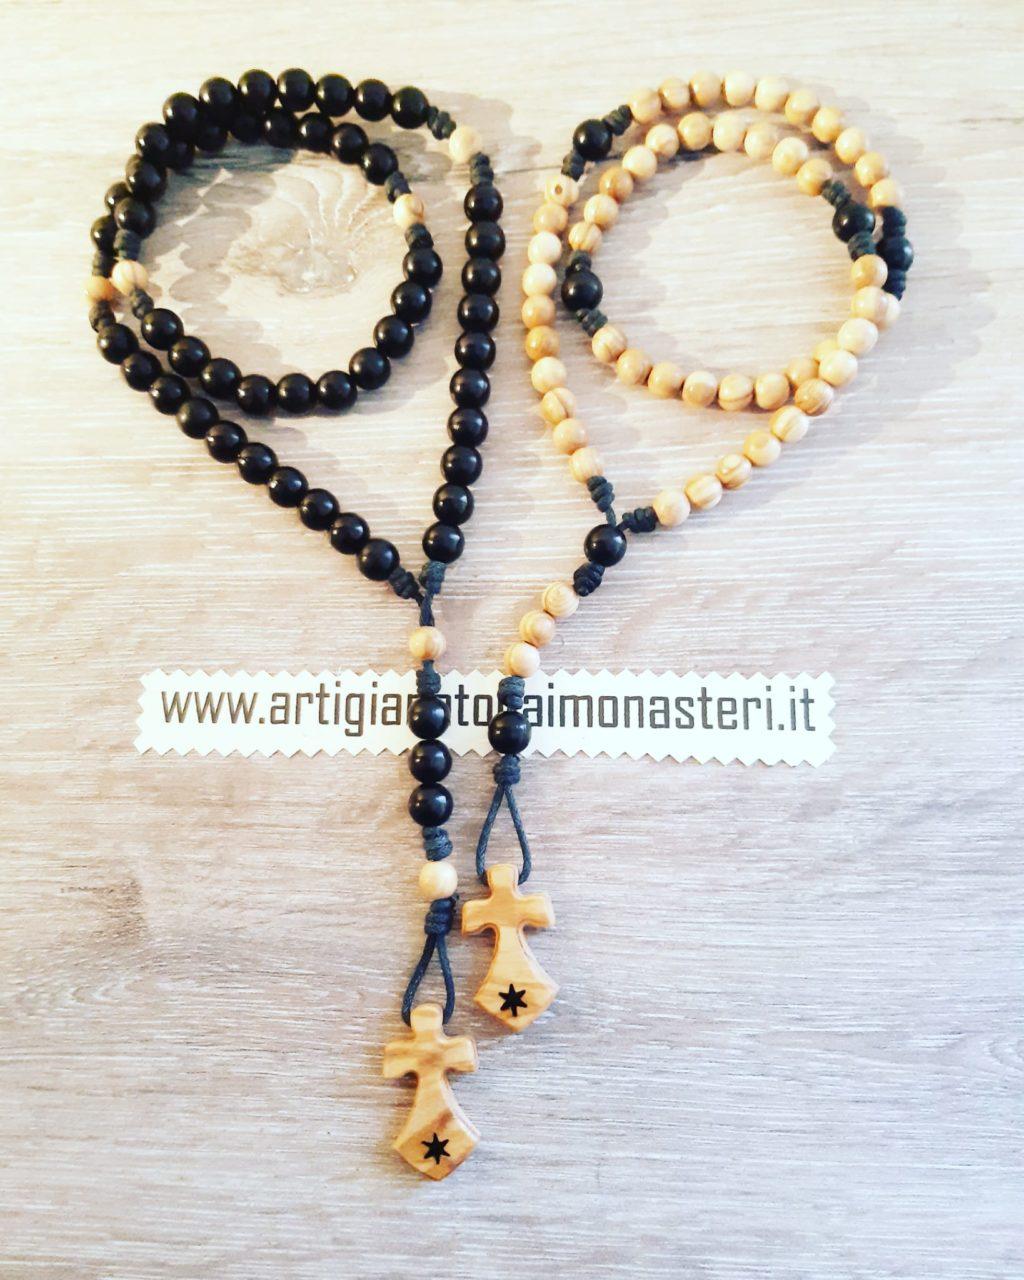 Rosario Carmelitano Black or Gold